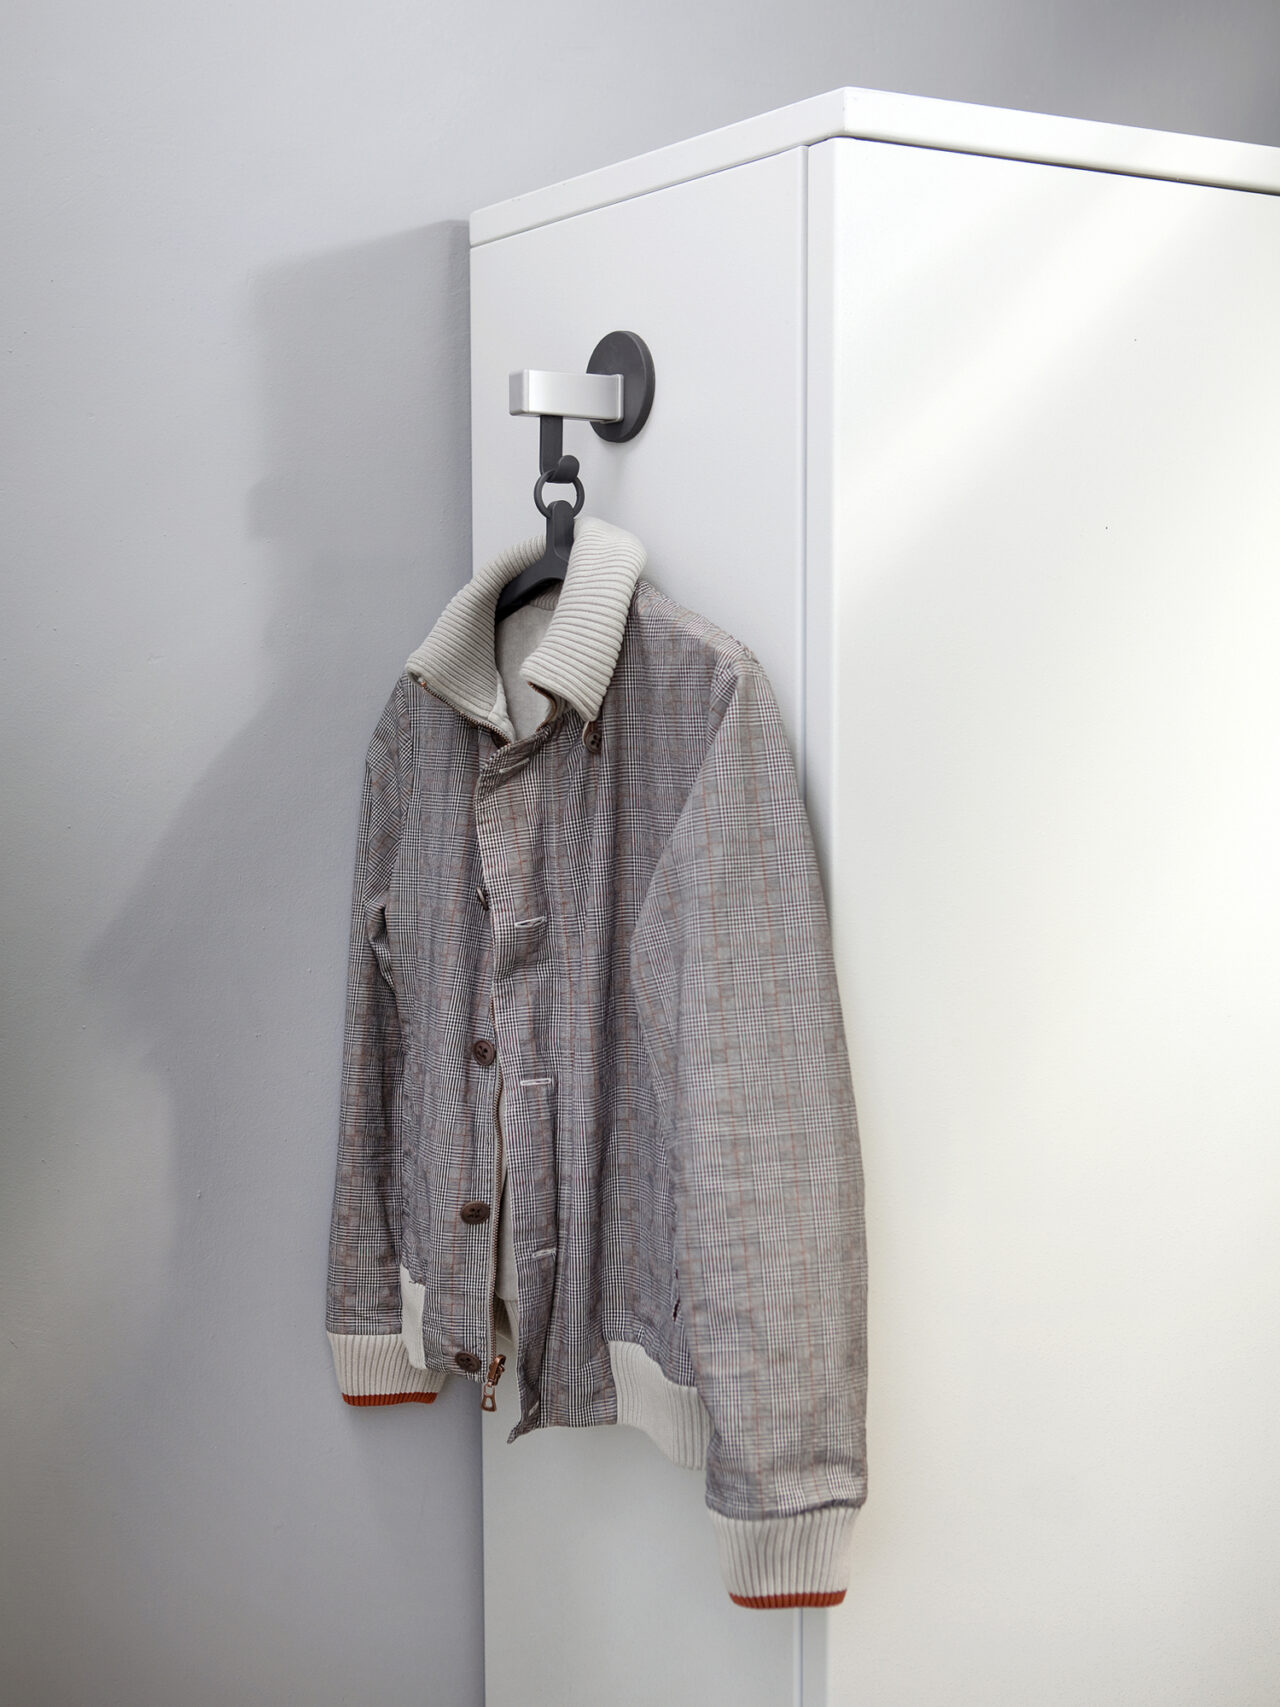 van Esch coat rack Ilium 10 Magnéfique